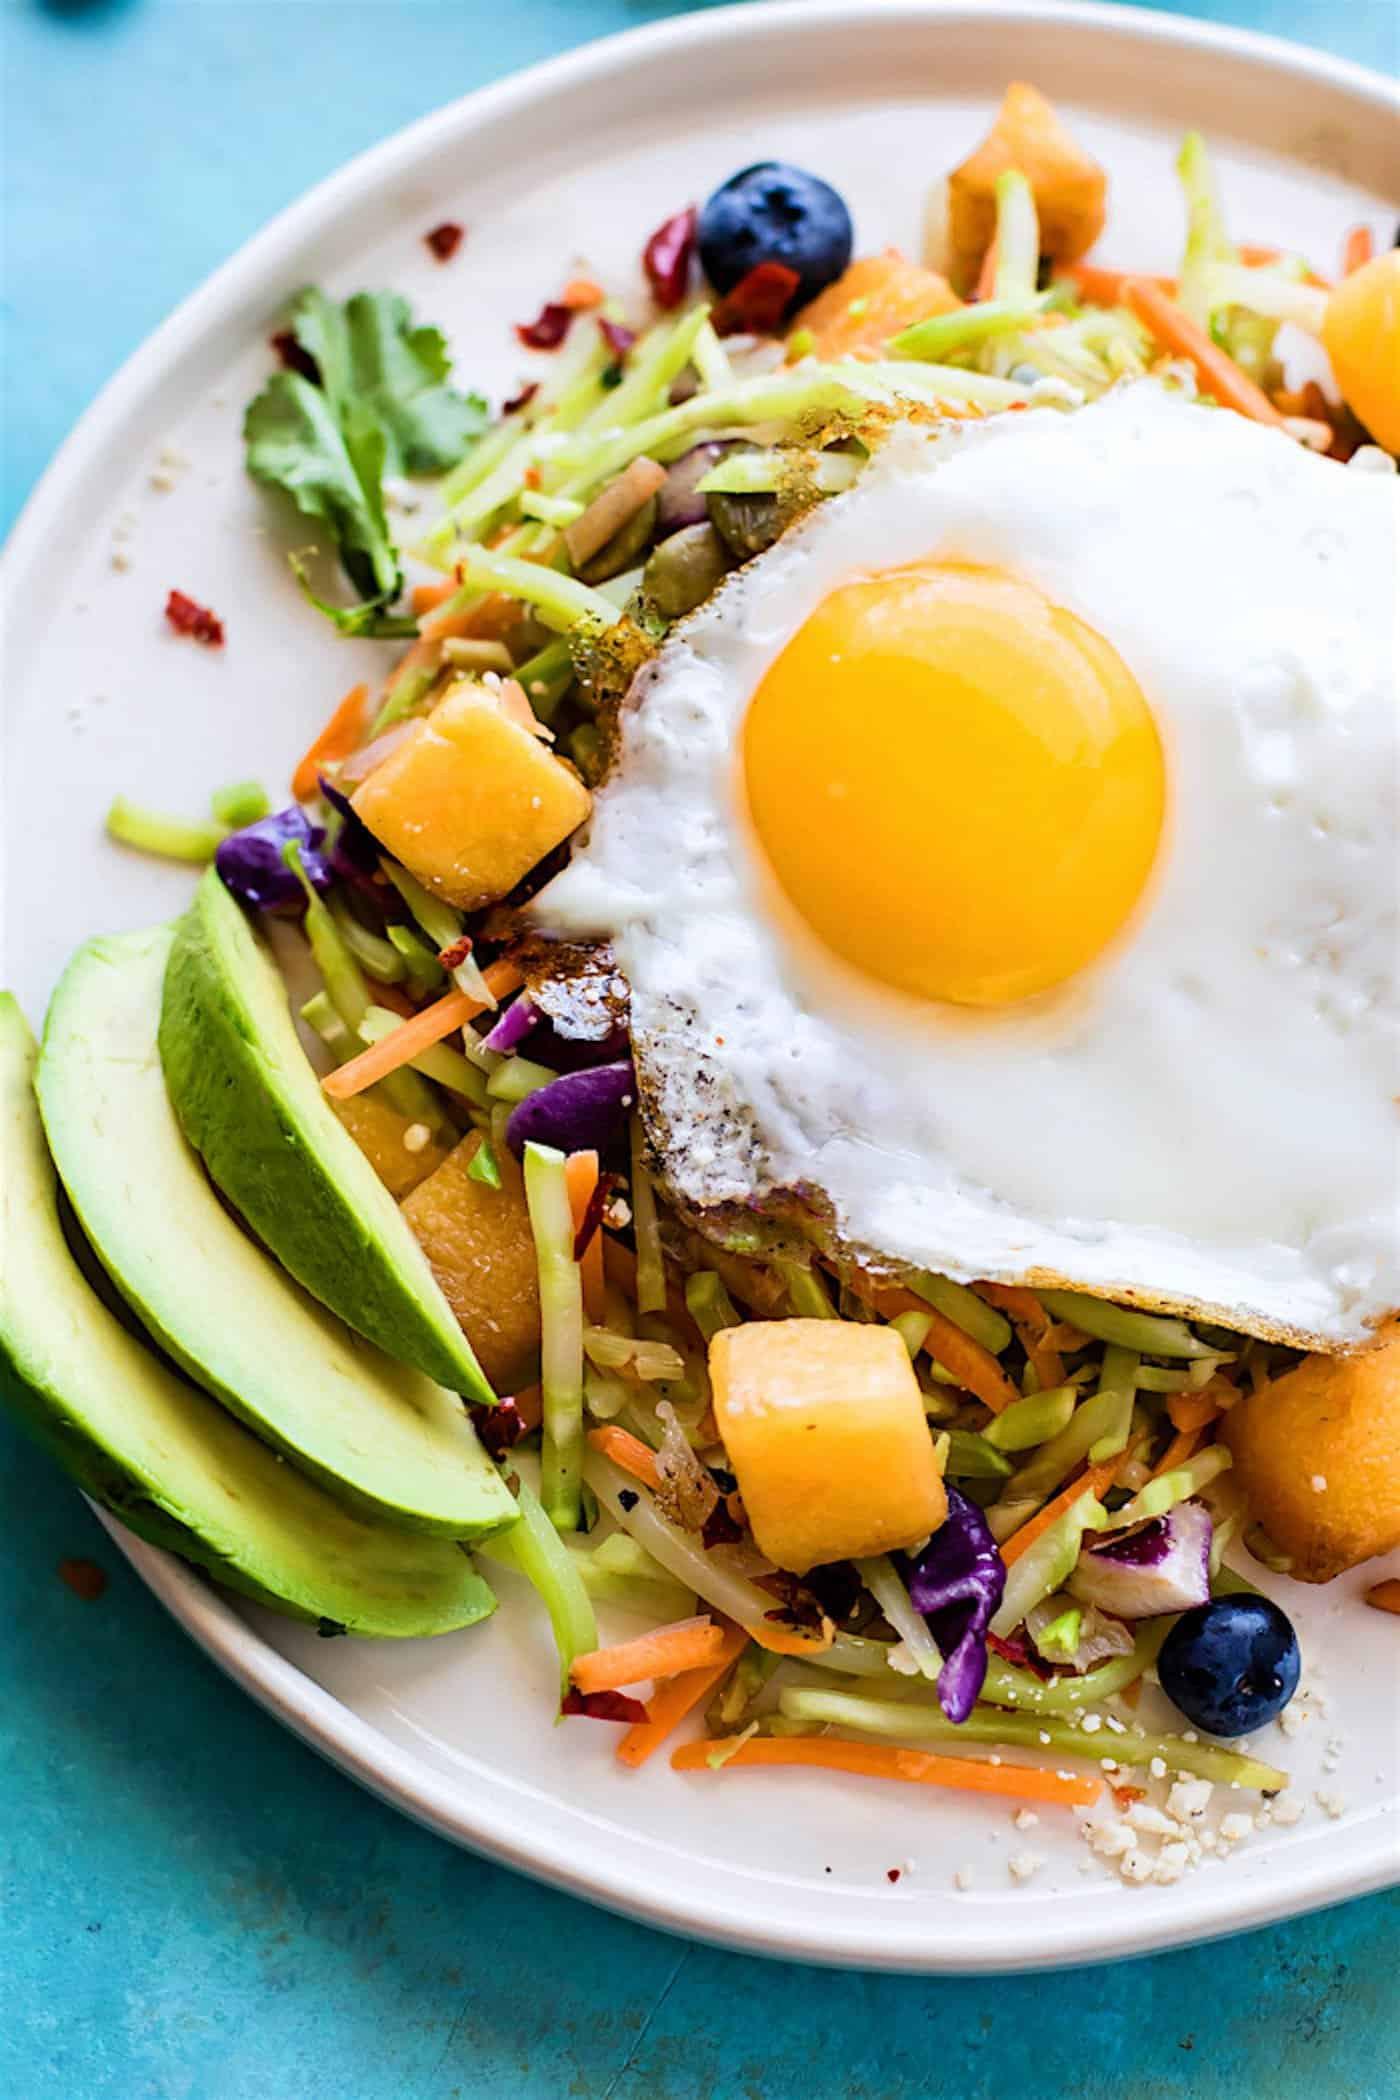 Healthy Keto Breakfast  20 Easy Keto Breakfast Recipes That ll Help You Lose